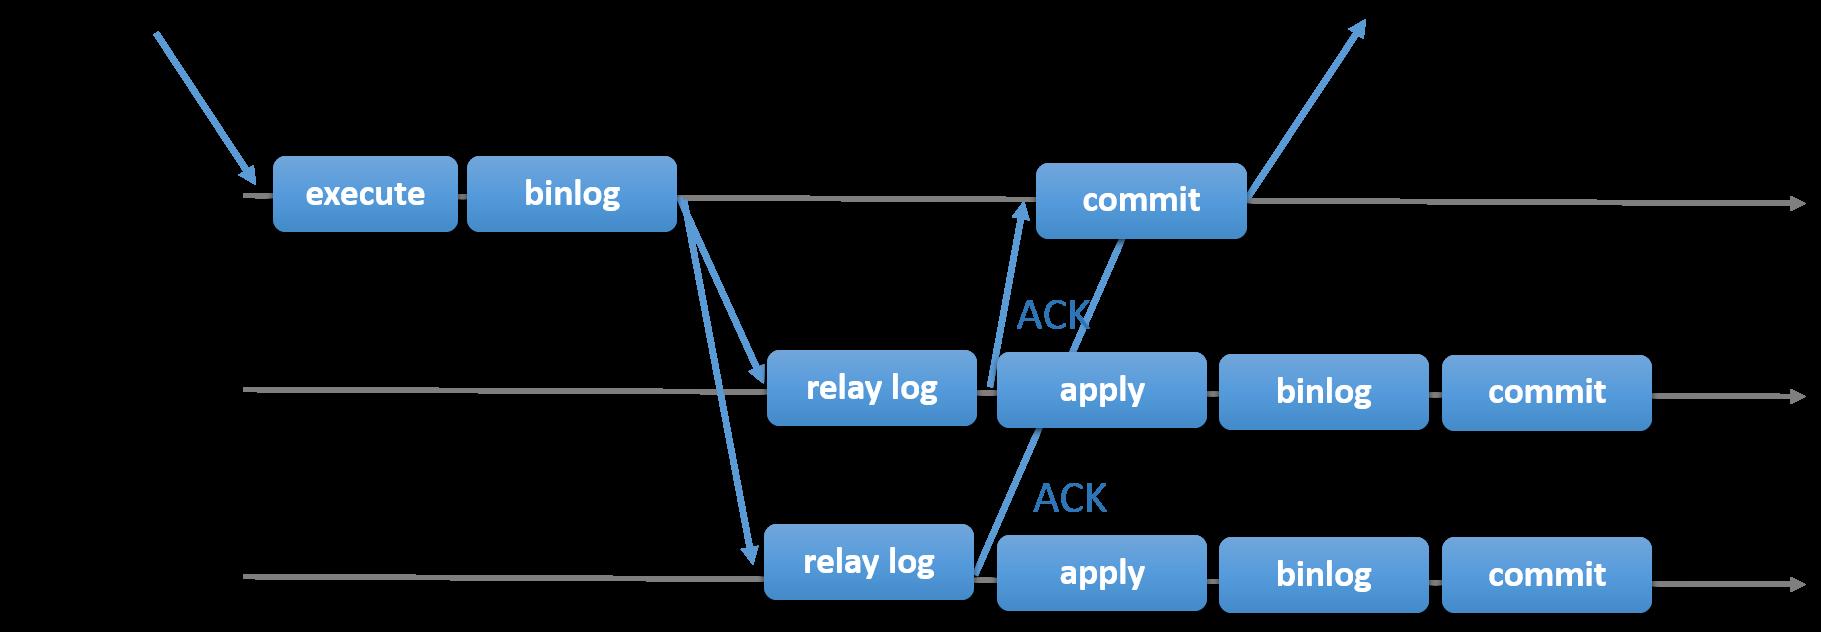 semisync-replication-diagram.png